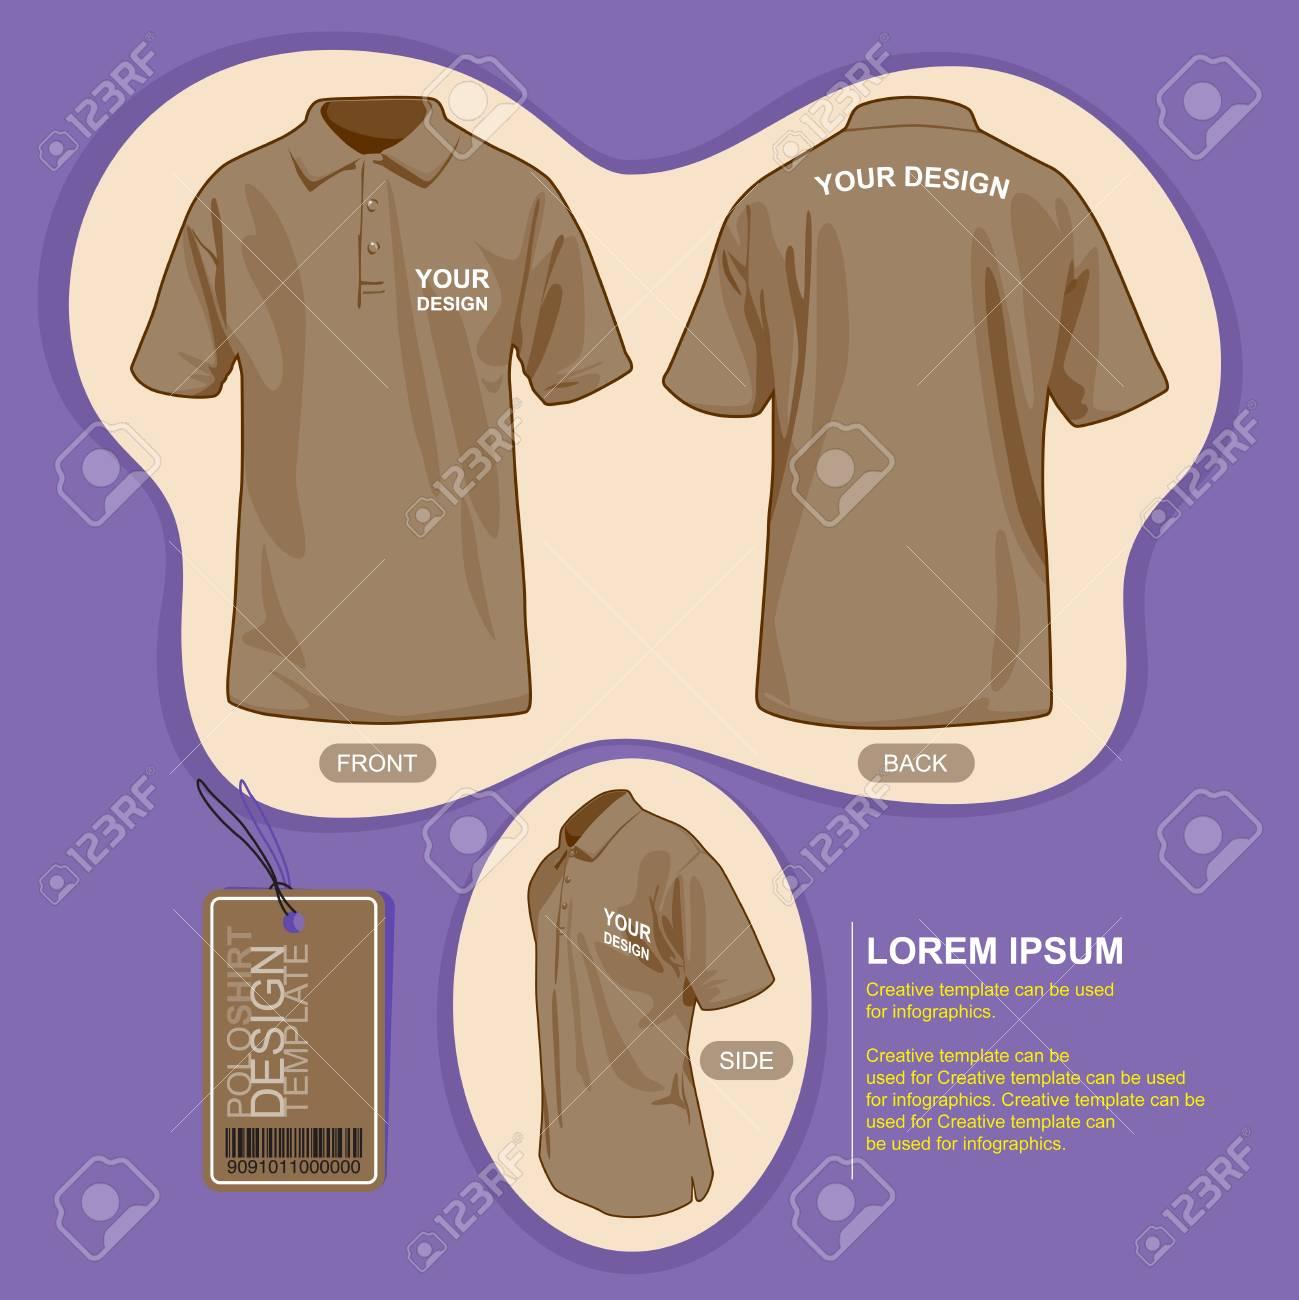 Shirt uniform design vector - Polo Shirt Uniform Template Illustration By Vector Design Stock Vector 49475777